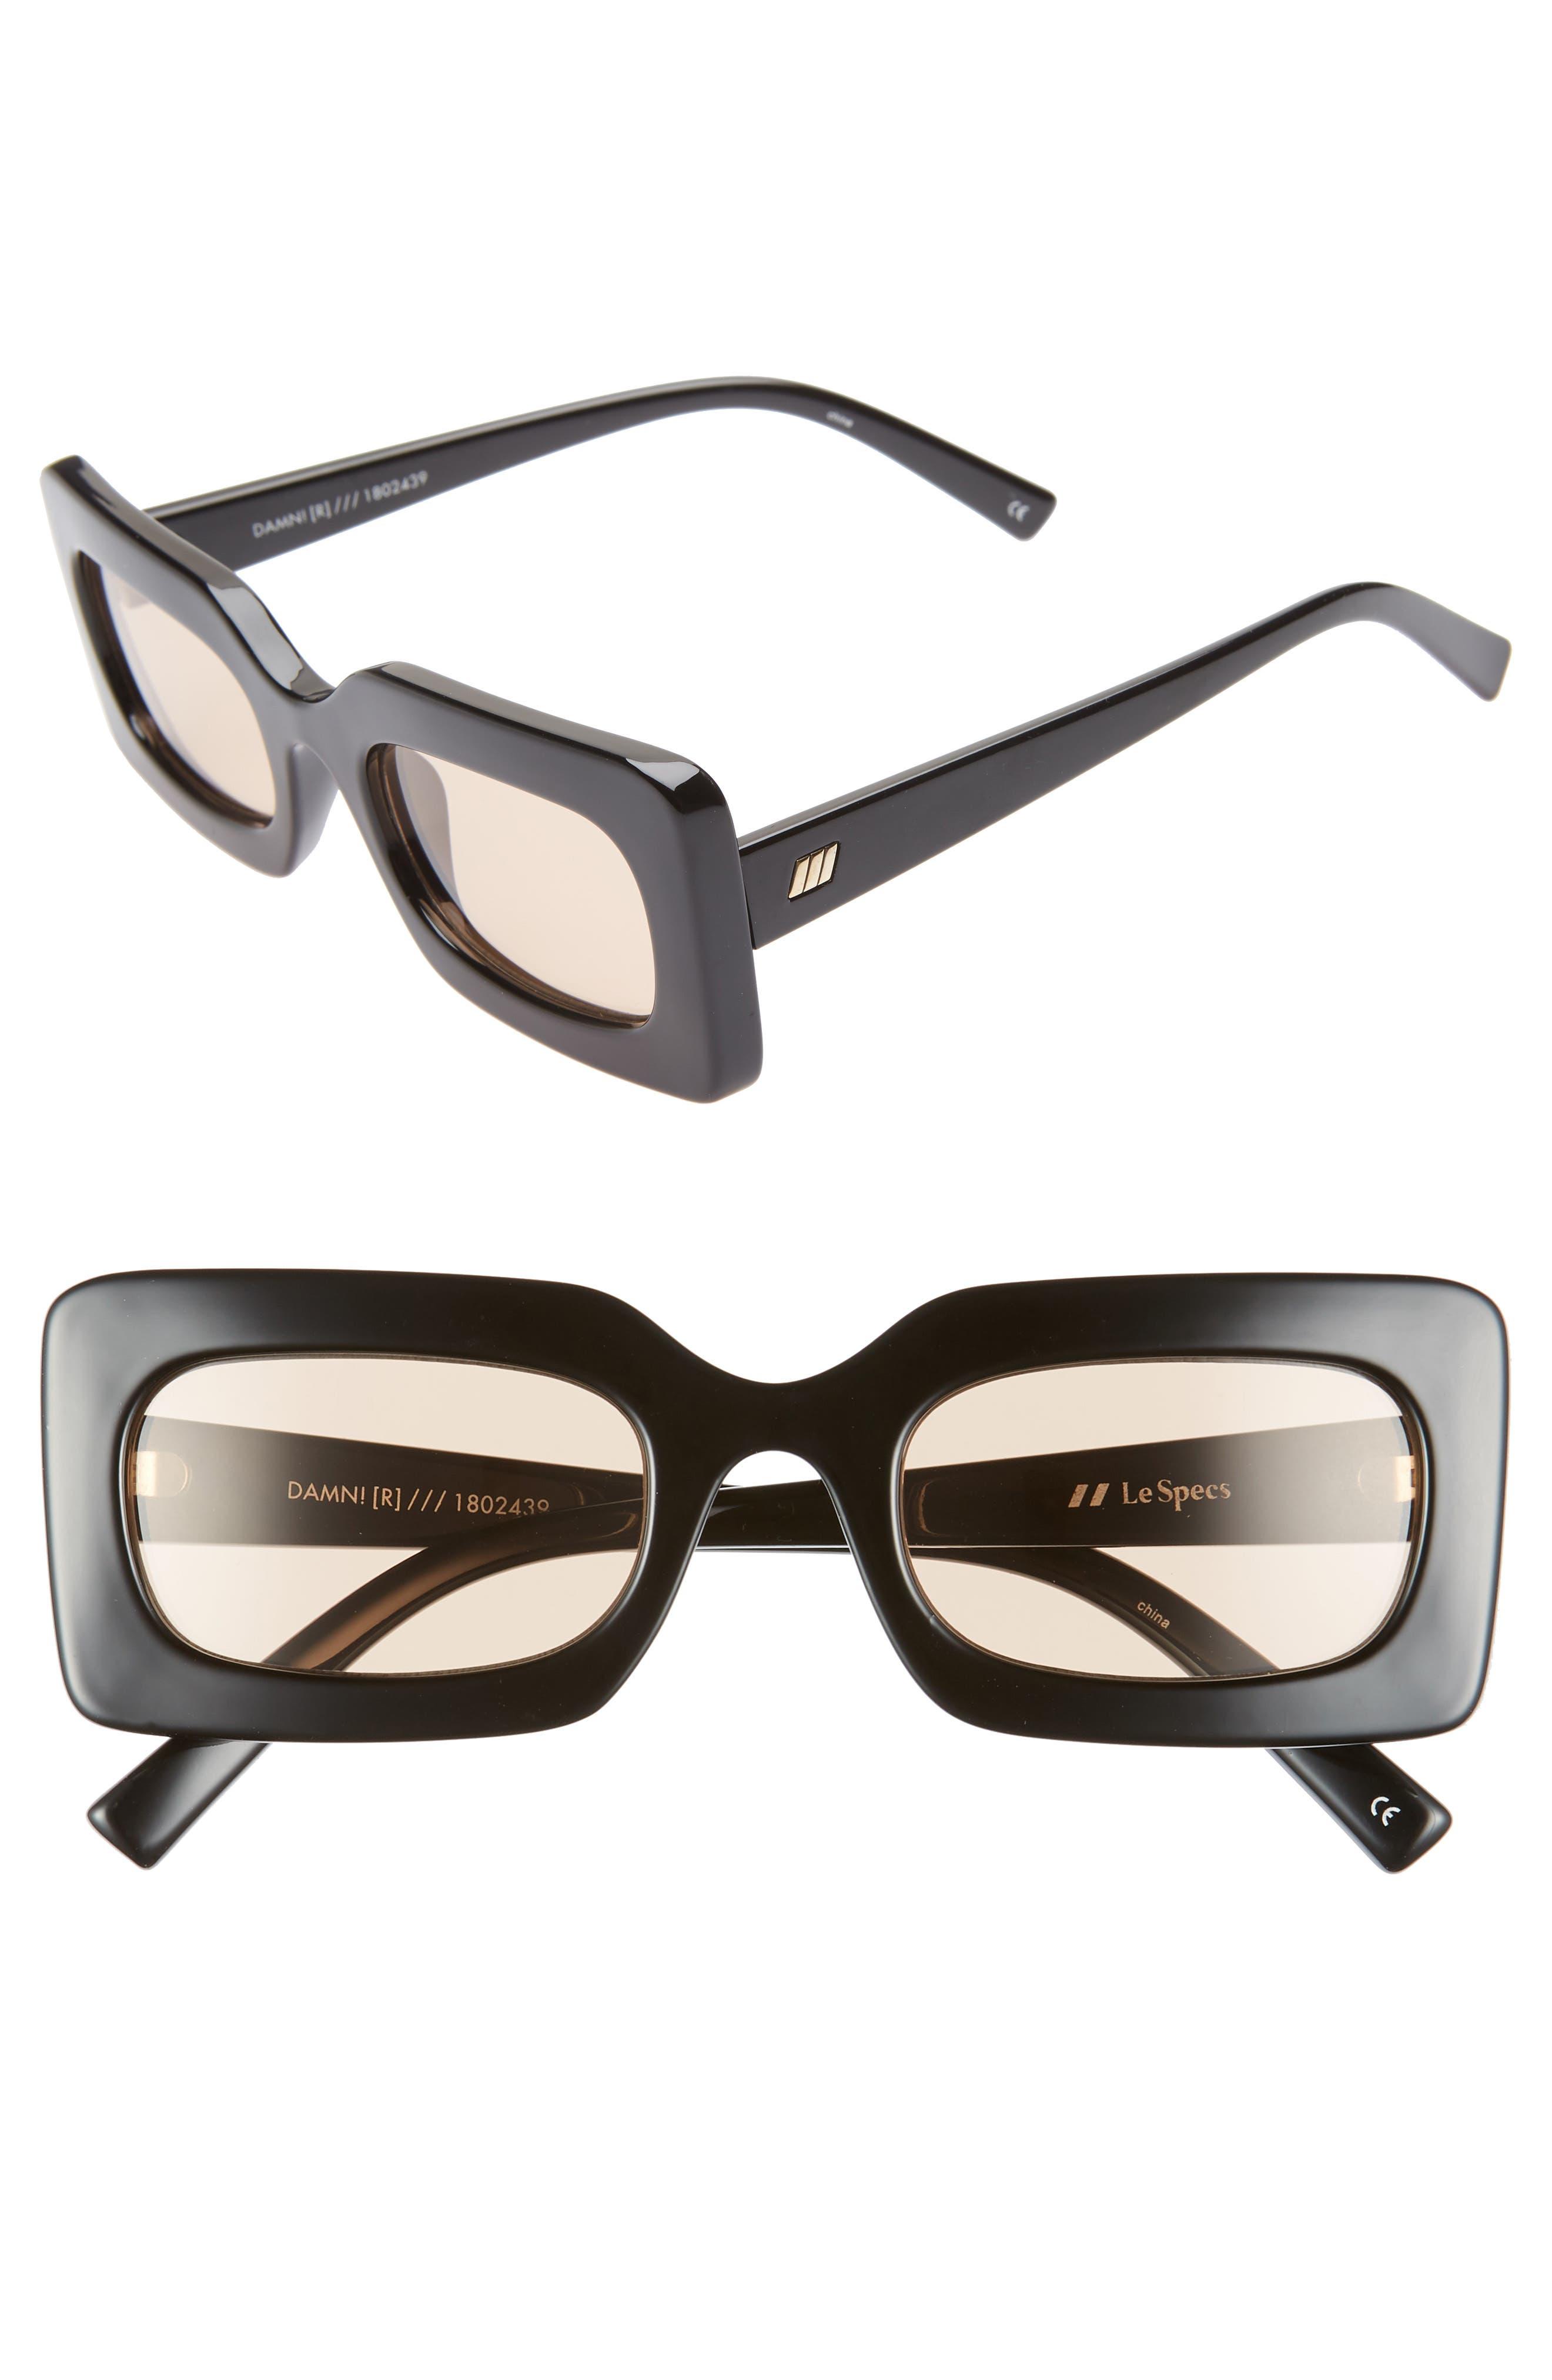 Le Specs 50Mm Rectangle Sunglasses - Black